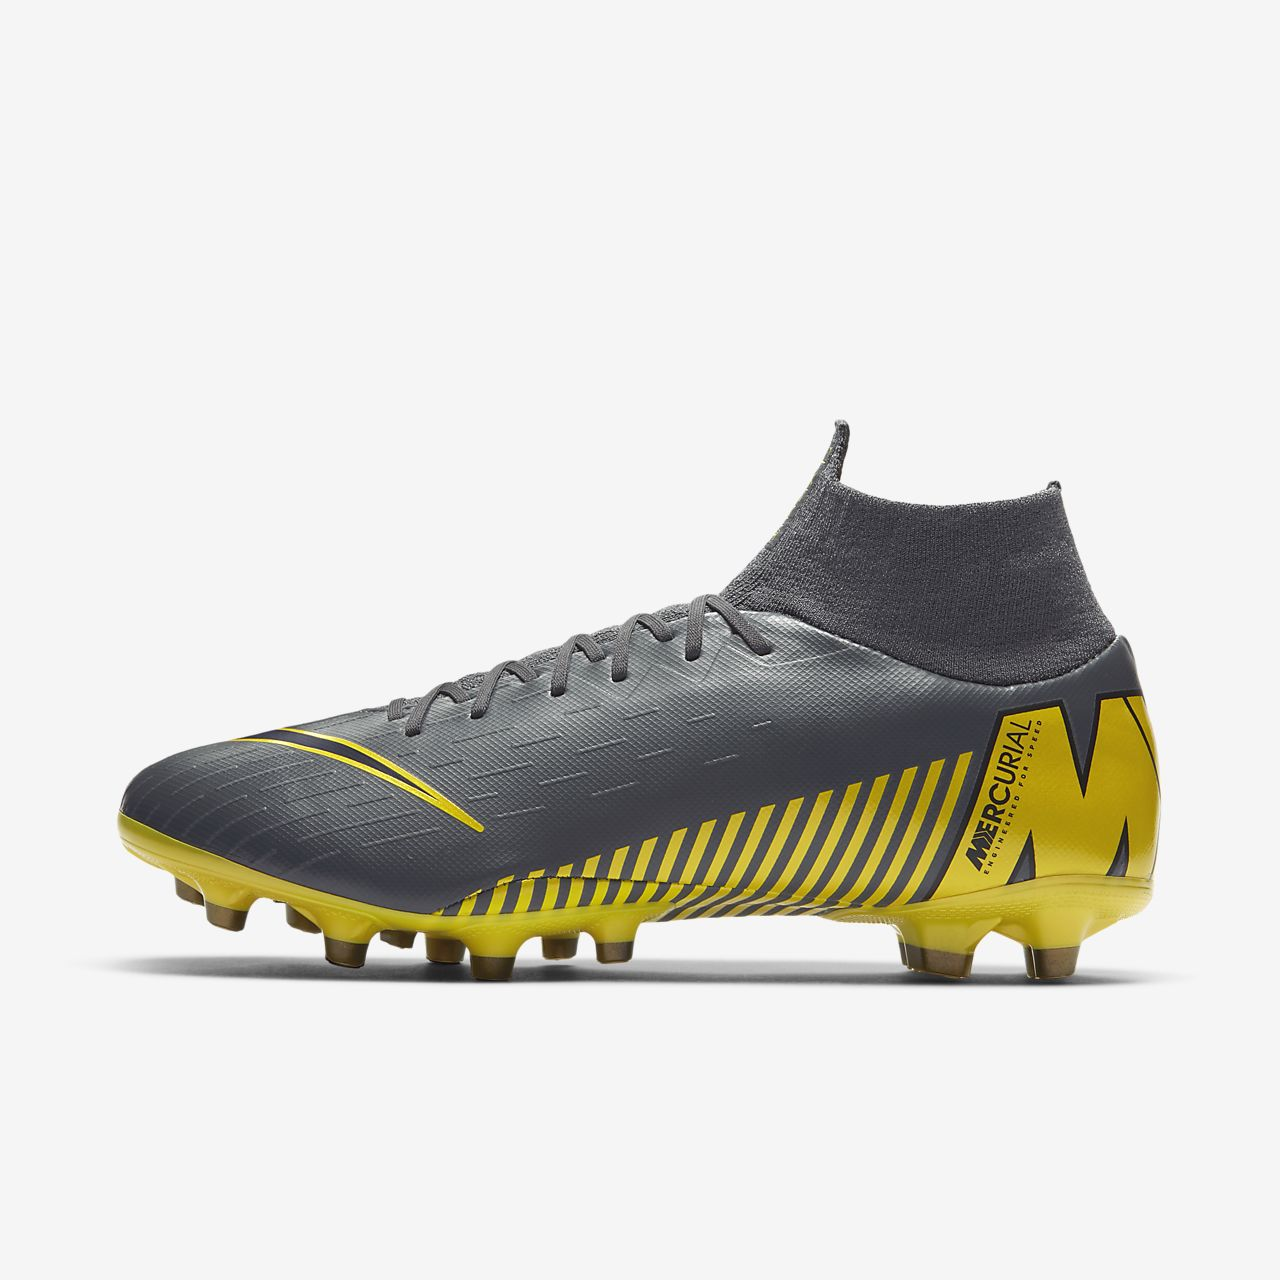 e58021a20bba6 ... Chaussure de football à crampons pour terrain synthétique Nike  Mercurial Superfly VI Pro AG-PRO